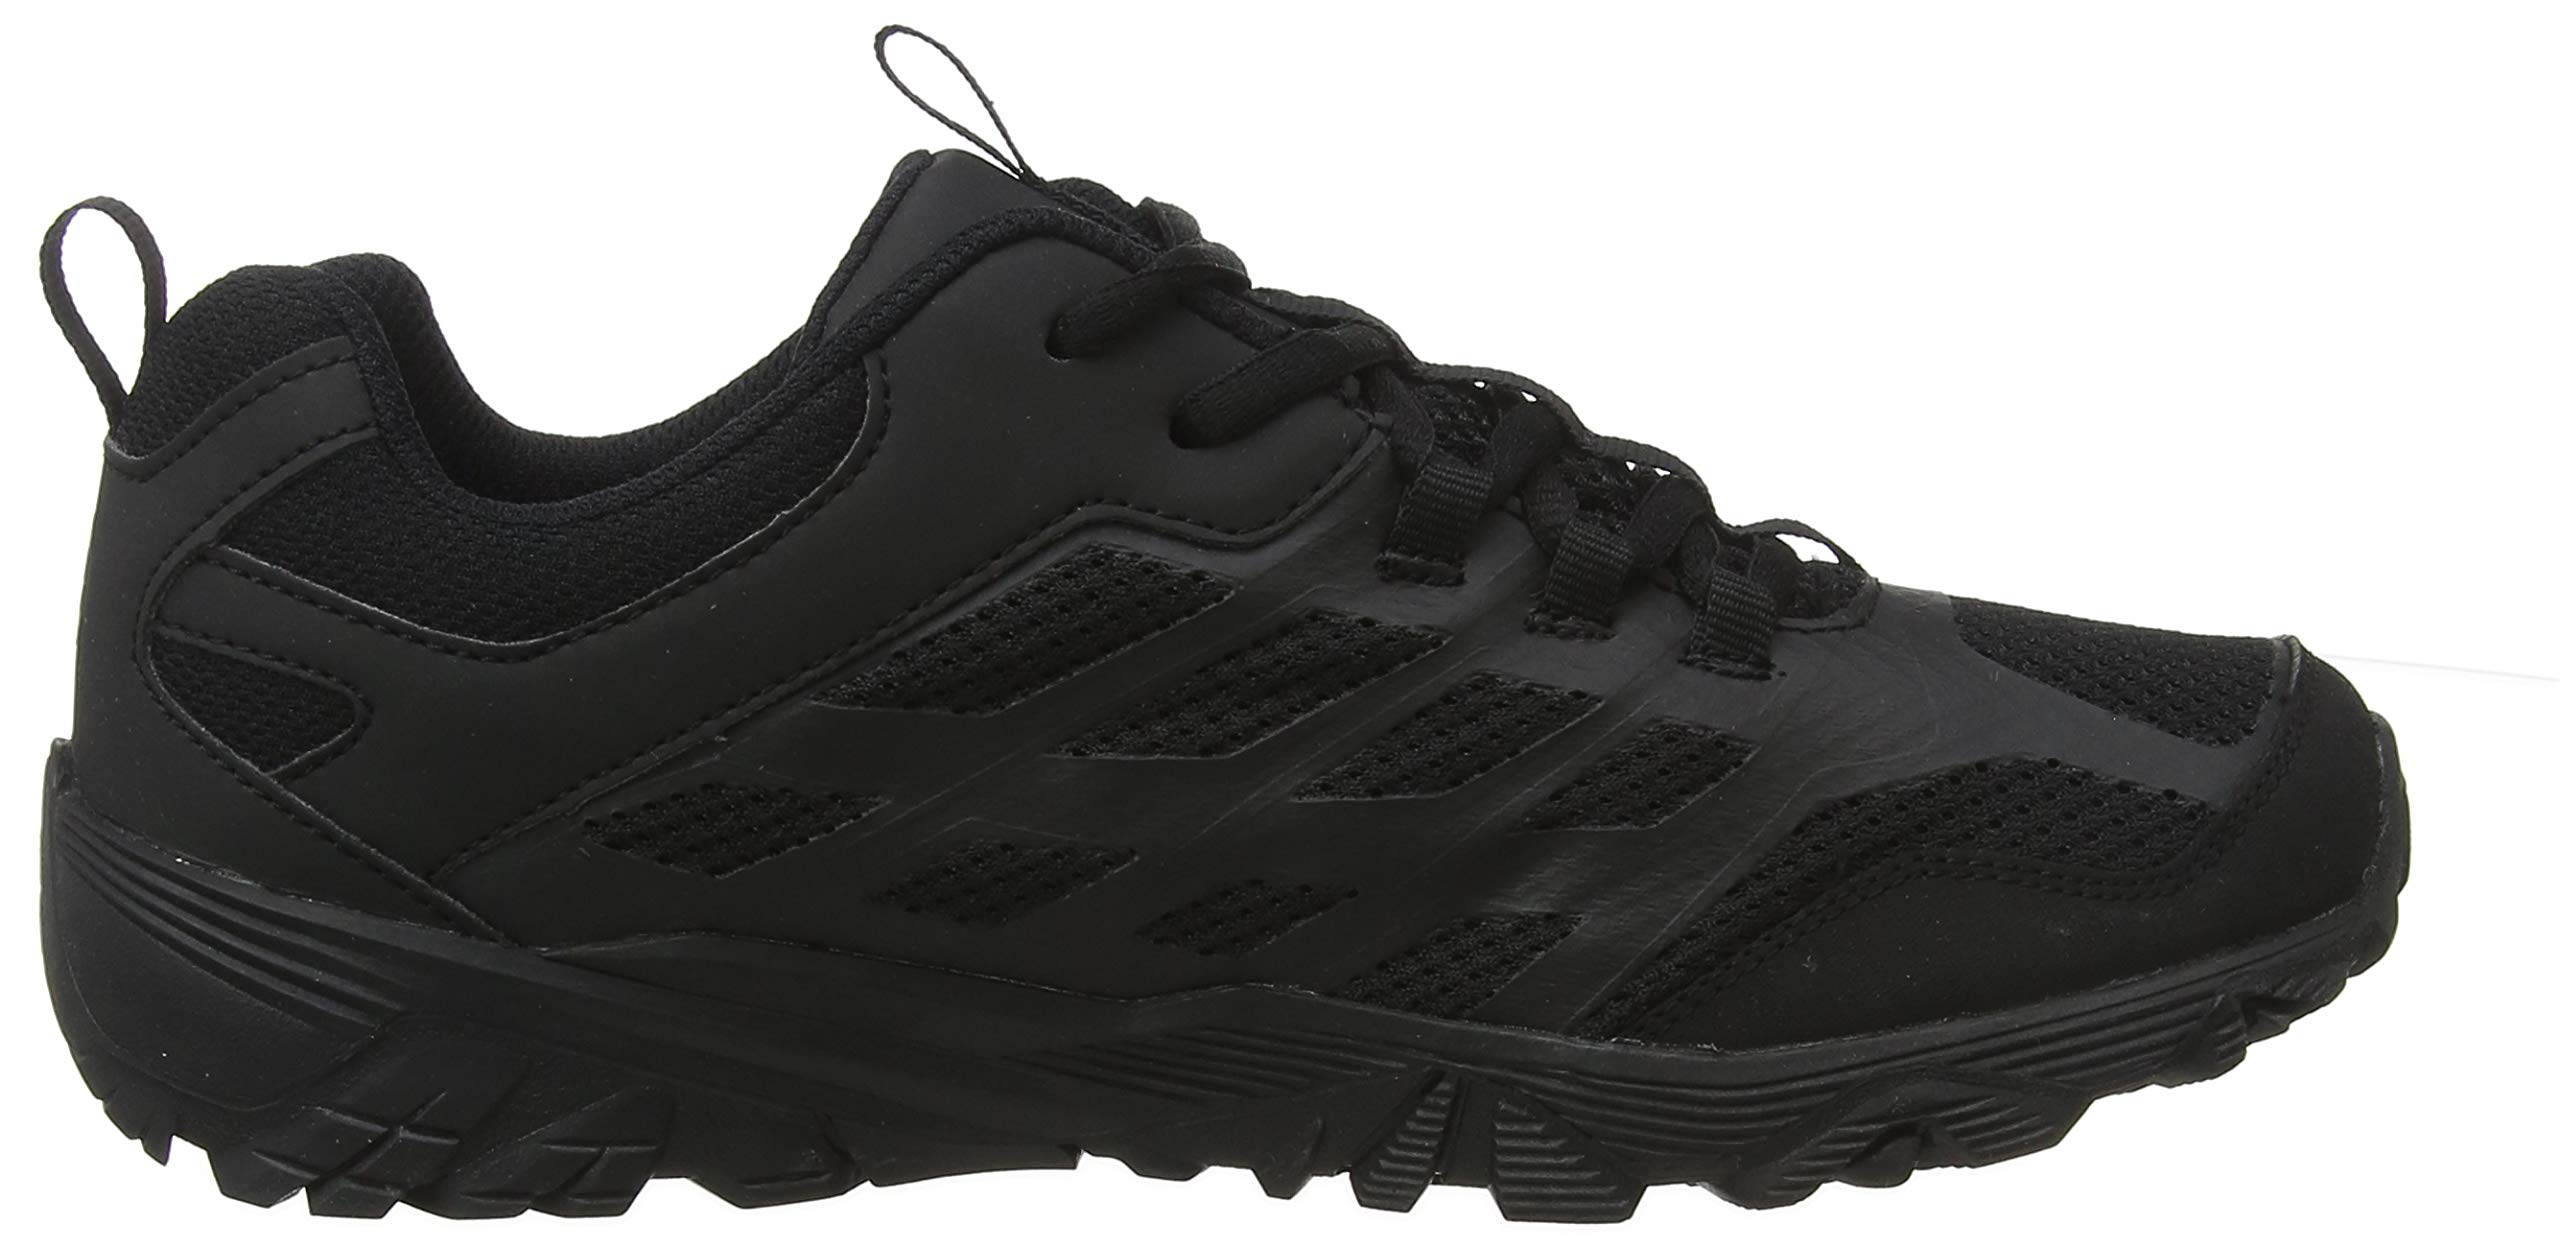 Merrell Unisex Kids' M-moab Fst Low Waterproof Rise Hiking Boots 7